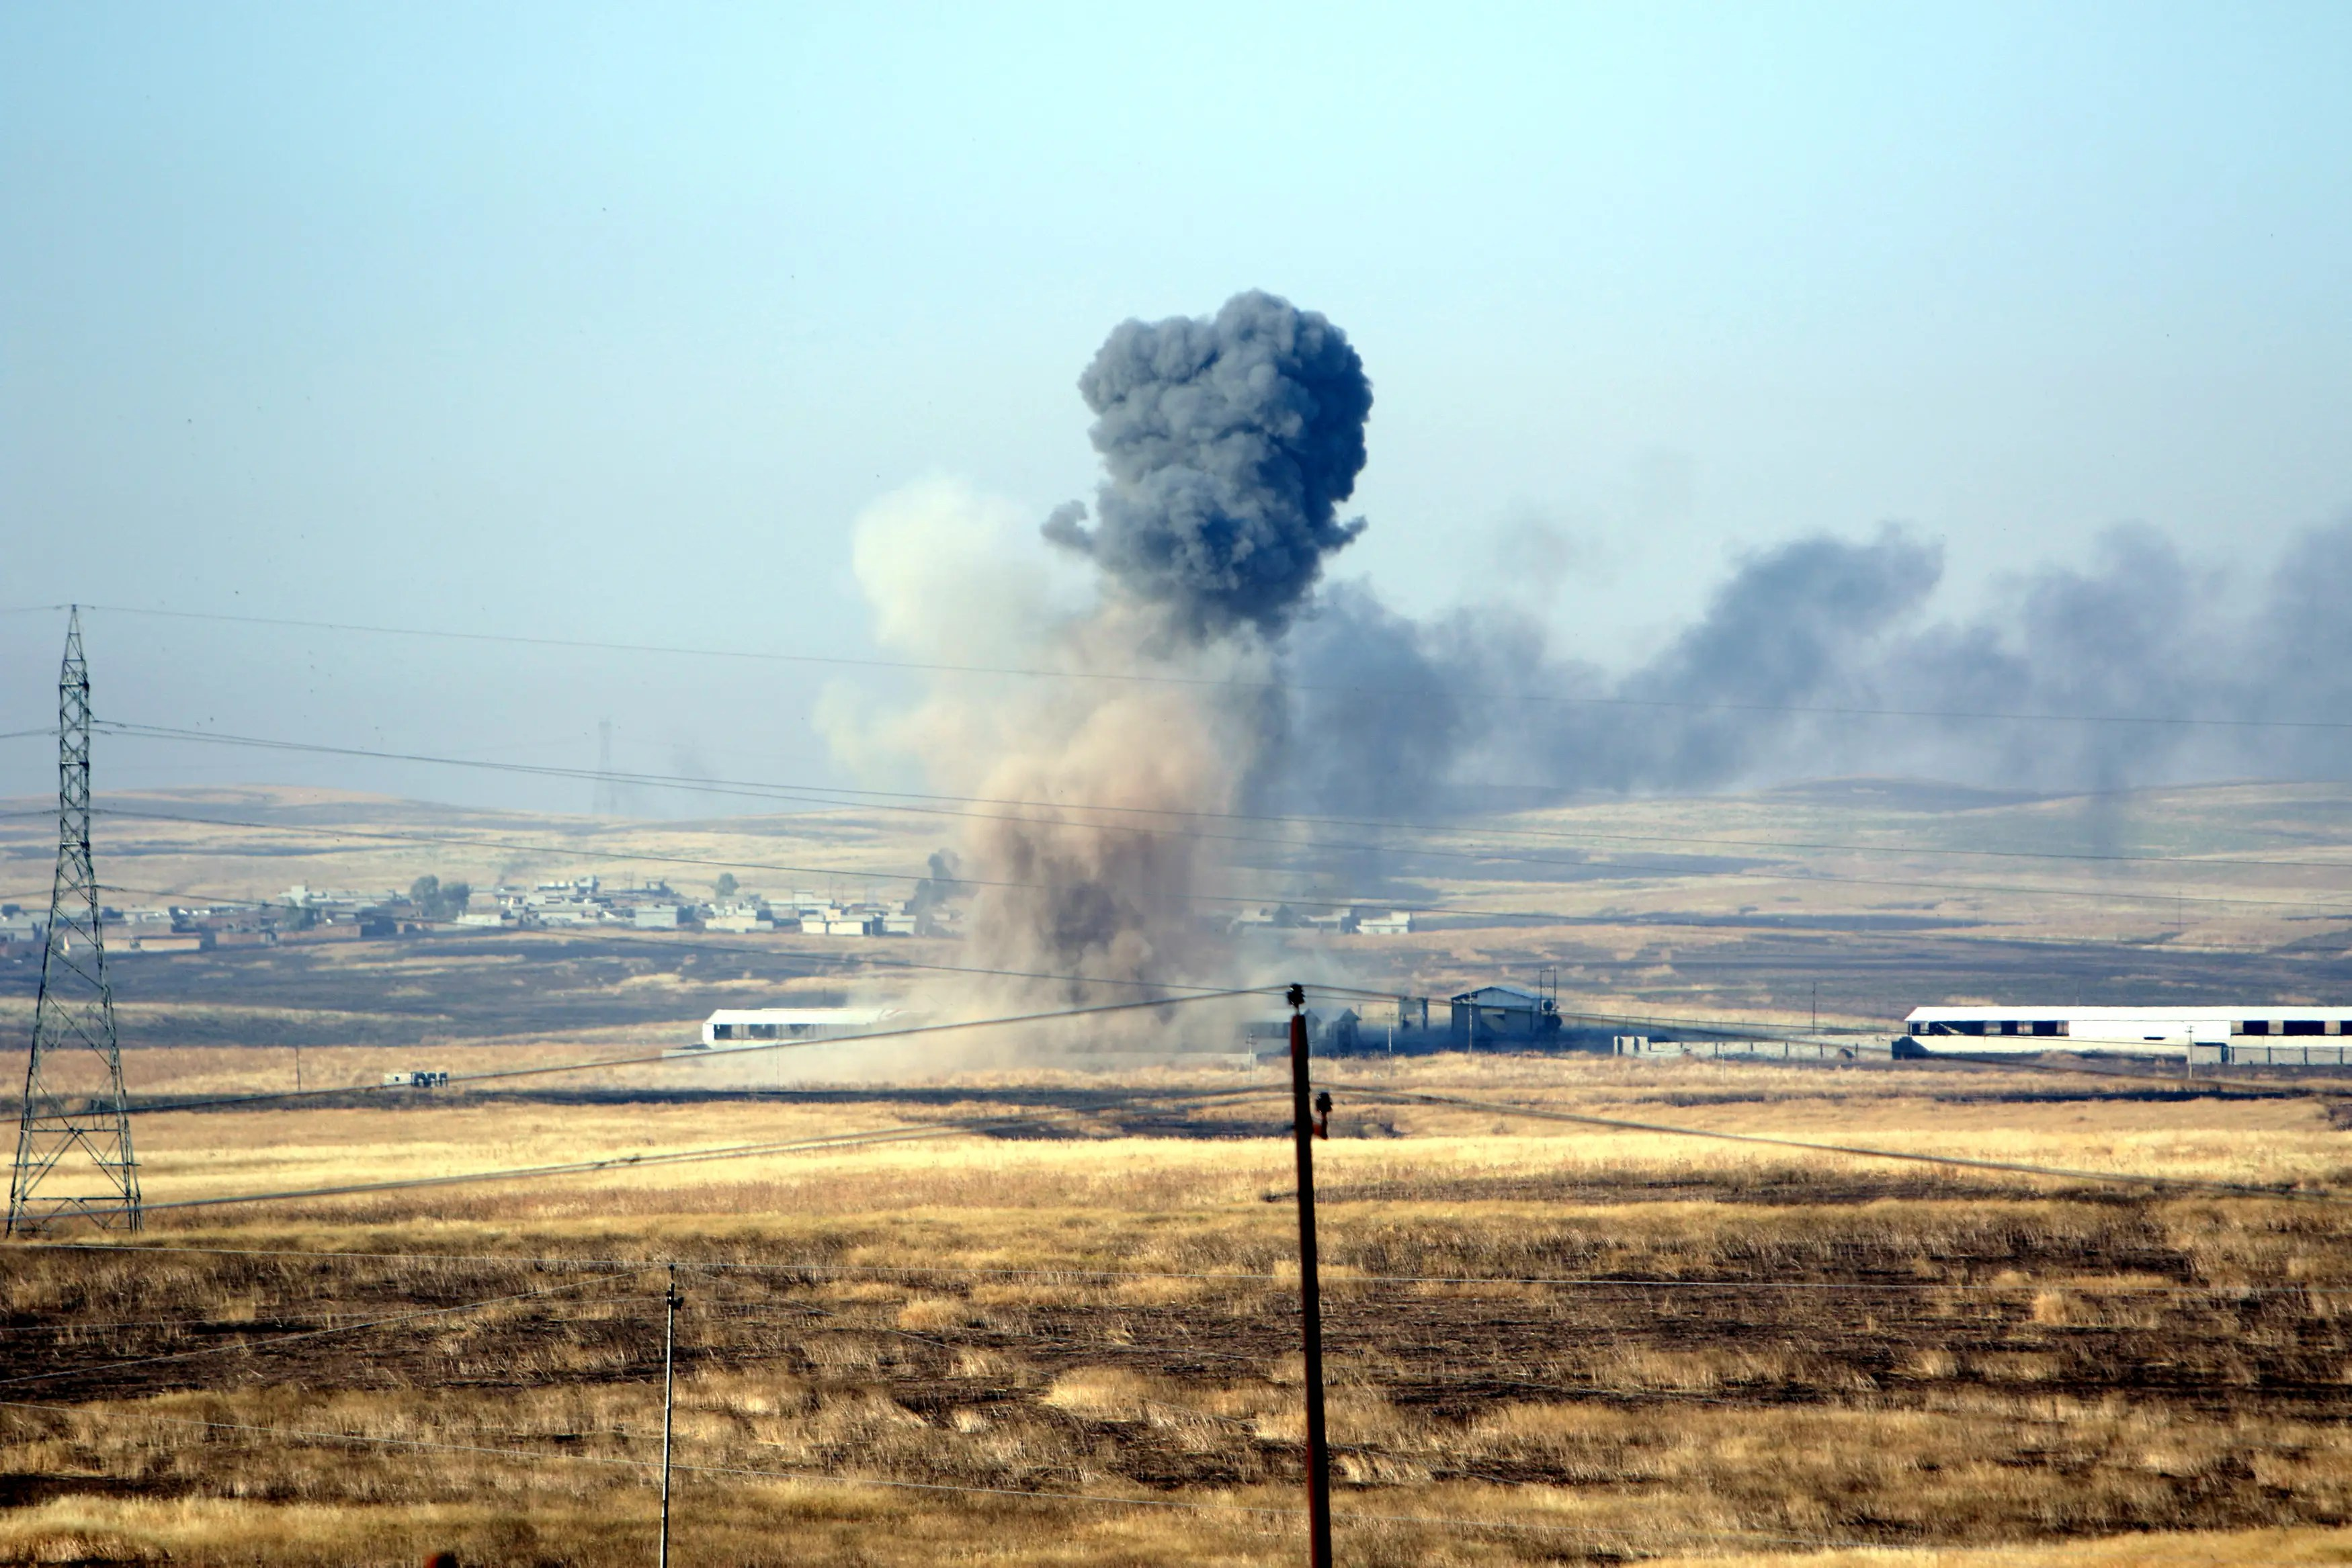 mosul iraq us airstrikes